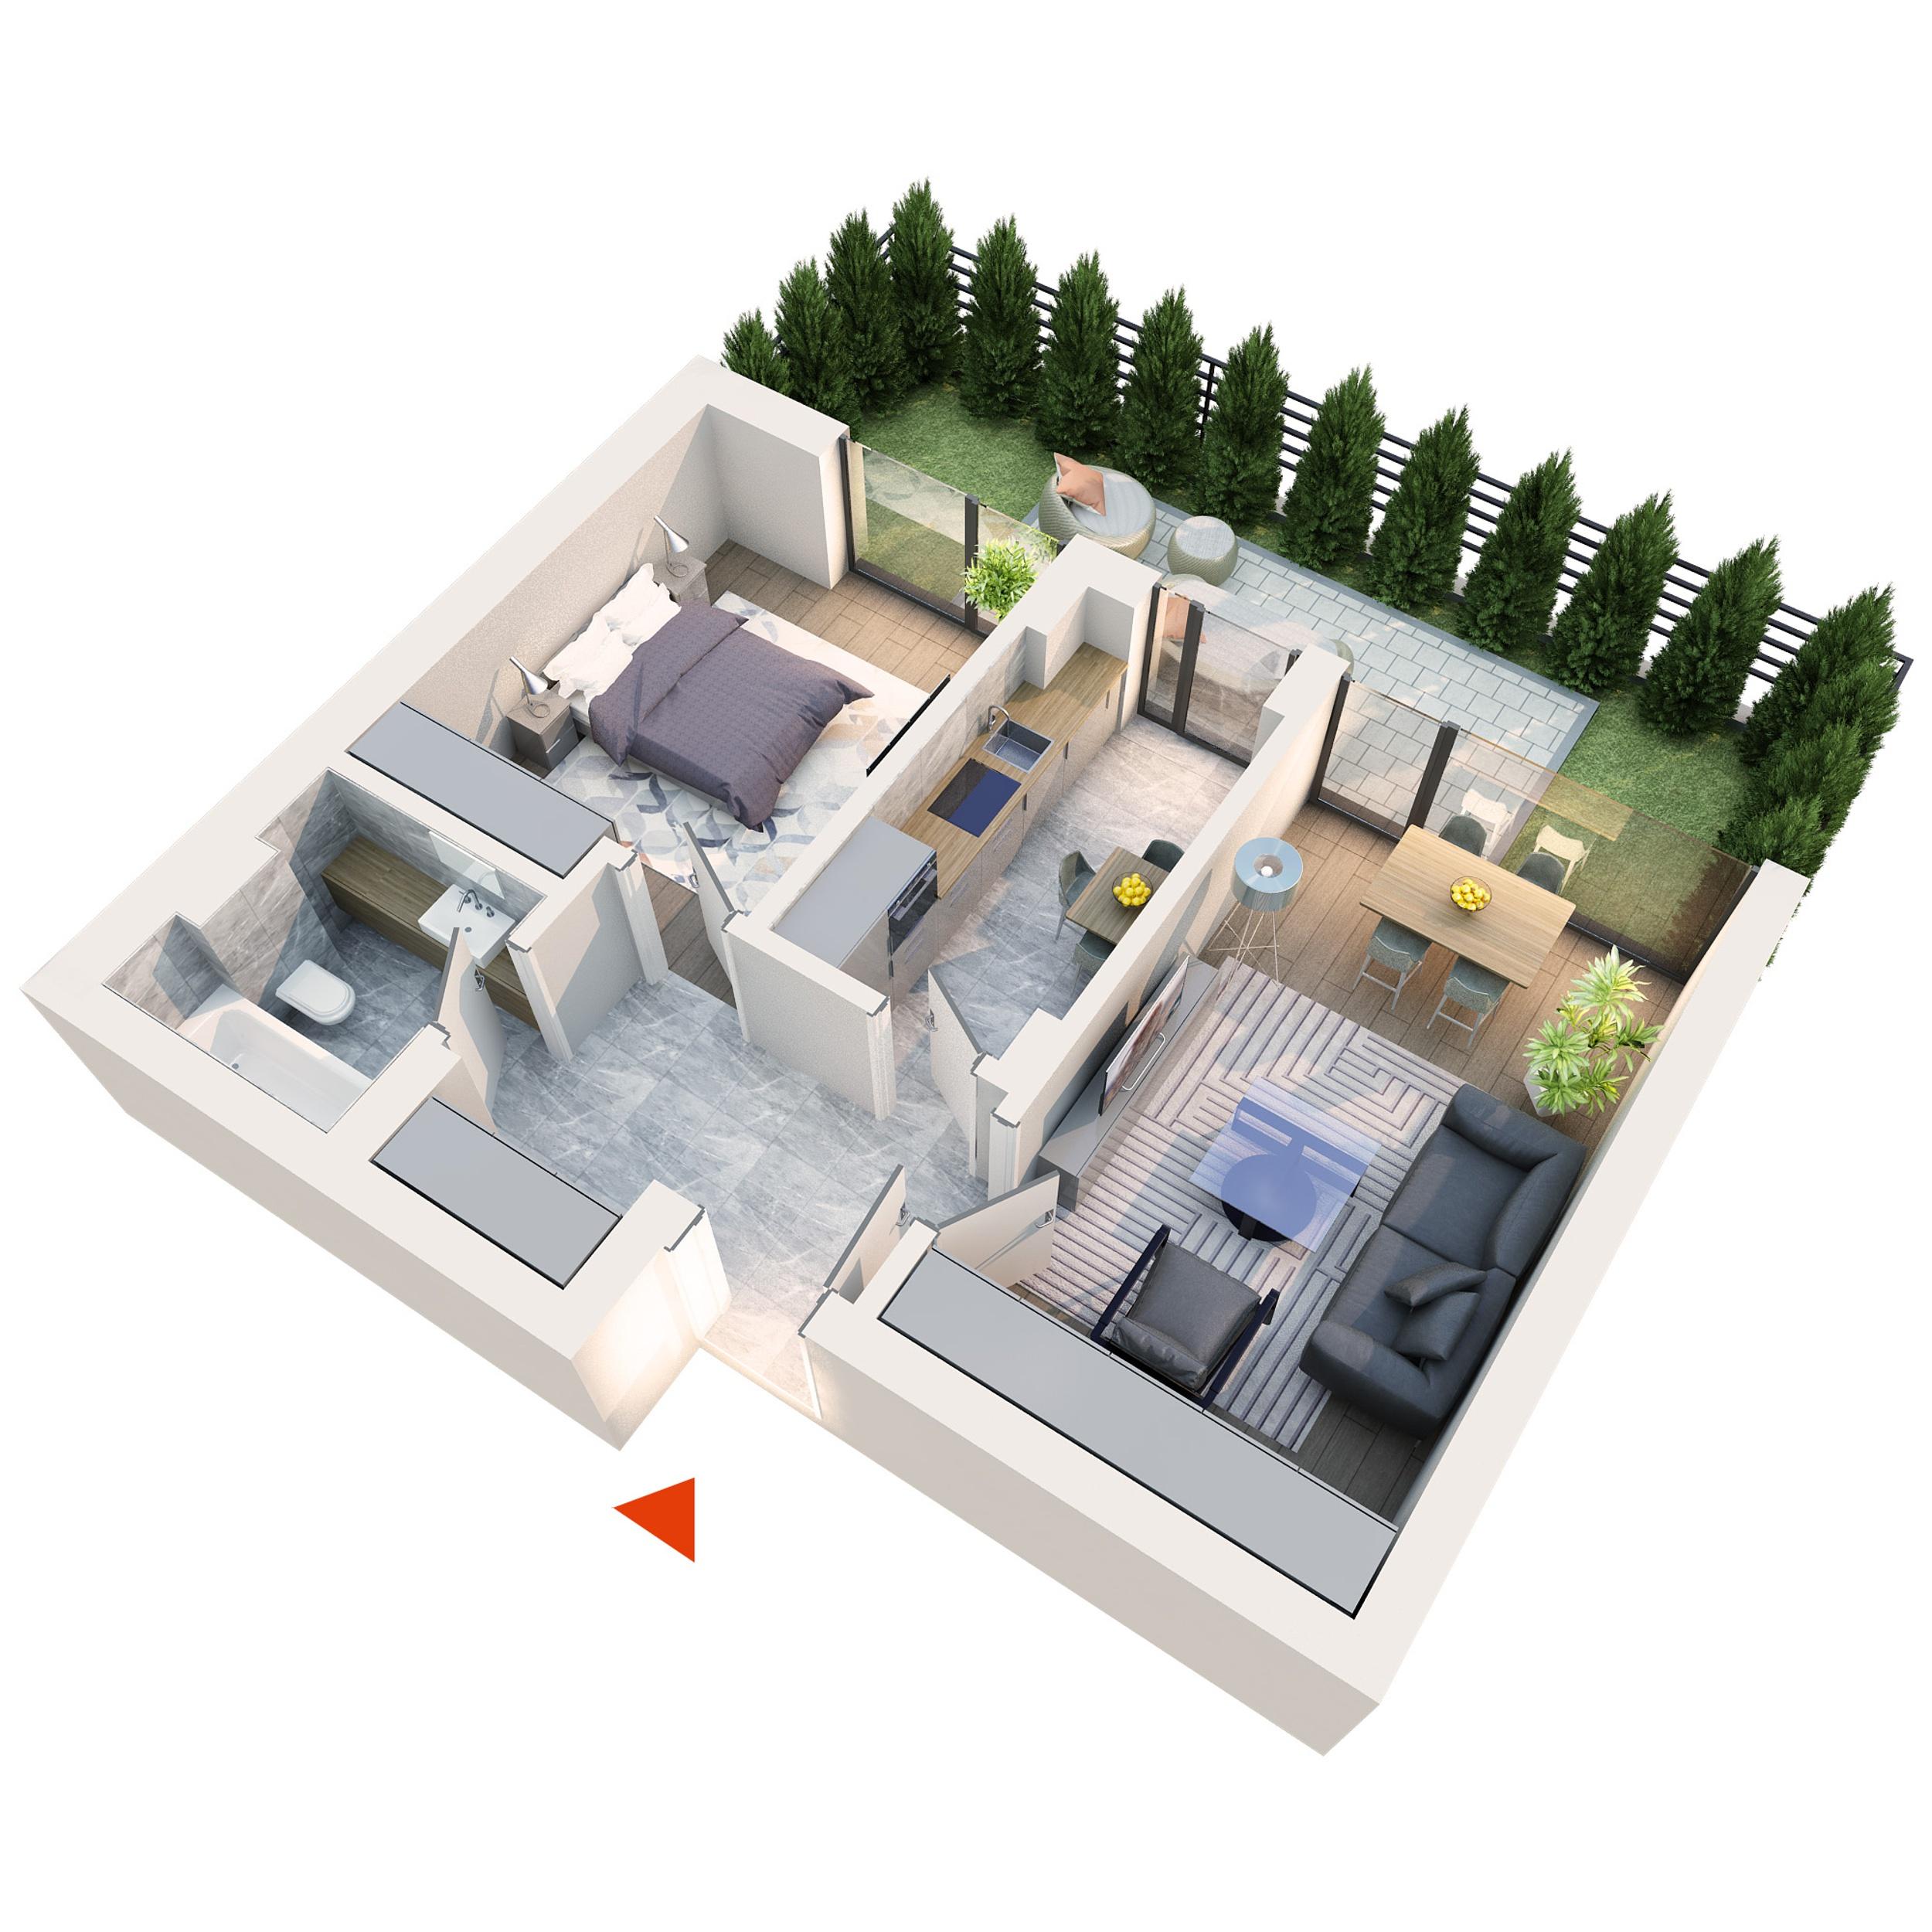 Apartament 2 camere tip 2A2 gradina | Parter | Corp C1, C6 | Faza 2